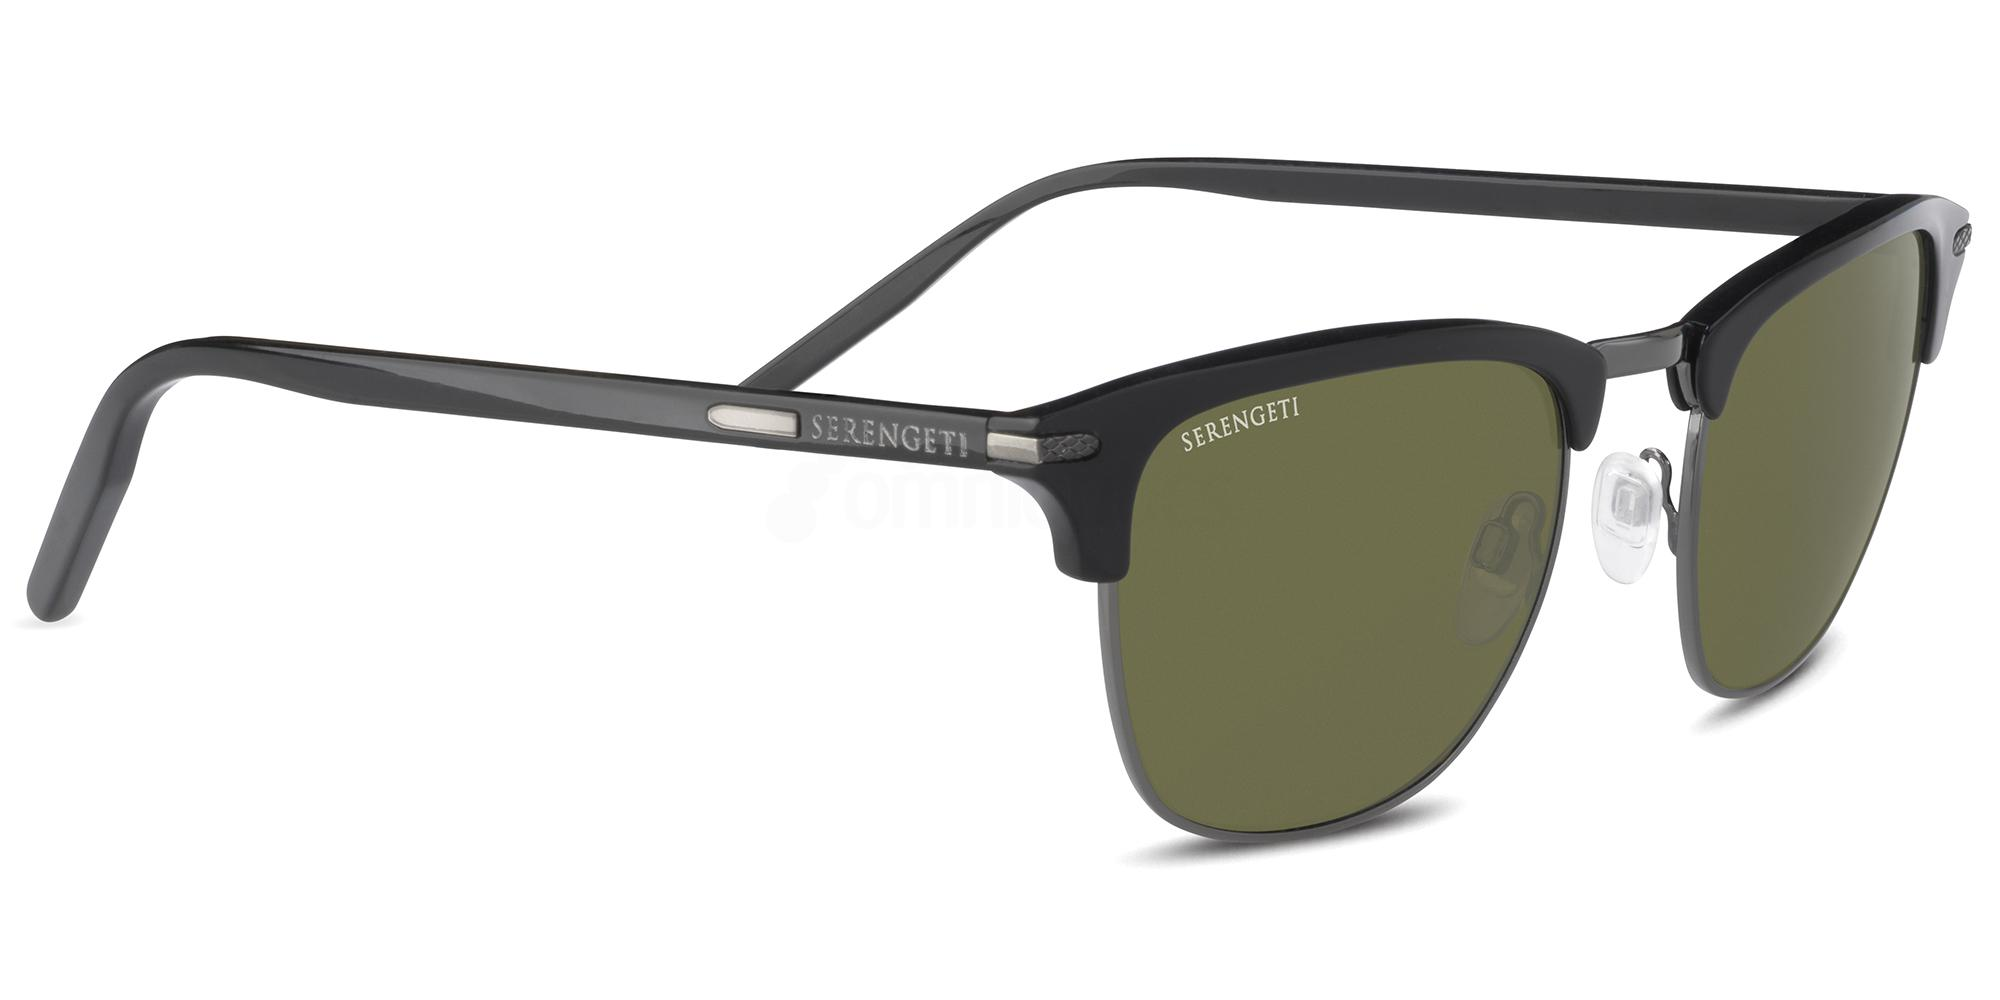 8943 ALRAY Sunglasses, Serengeti